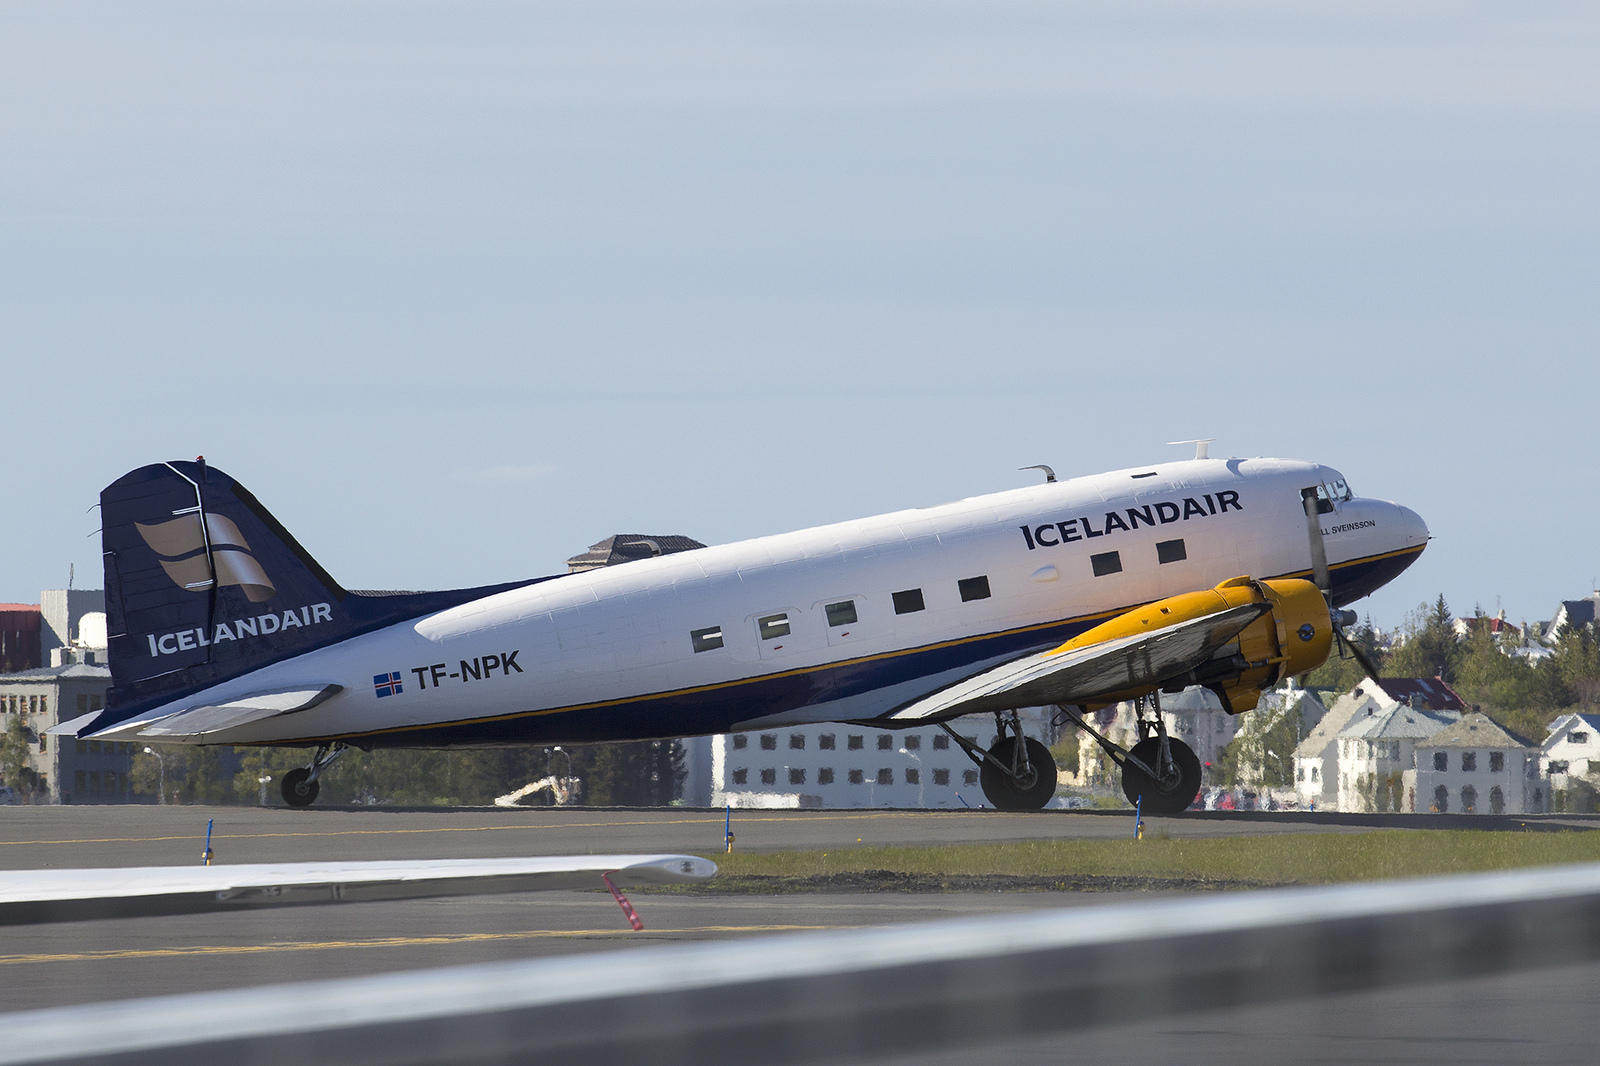 Douglas DC-3 reg. TF-NPK // Source: Karl Georg Karlsson